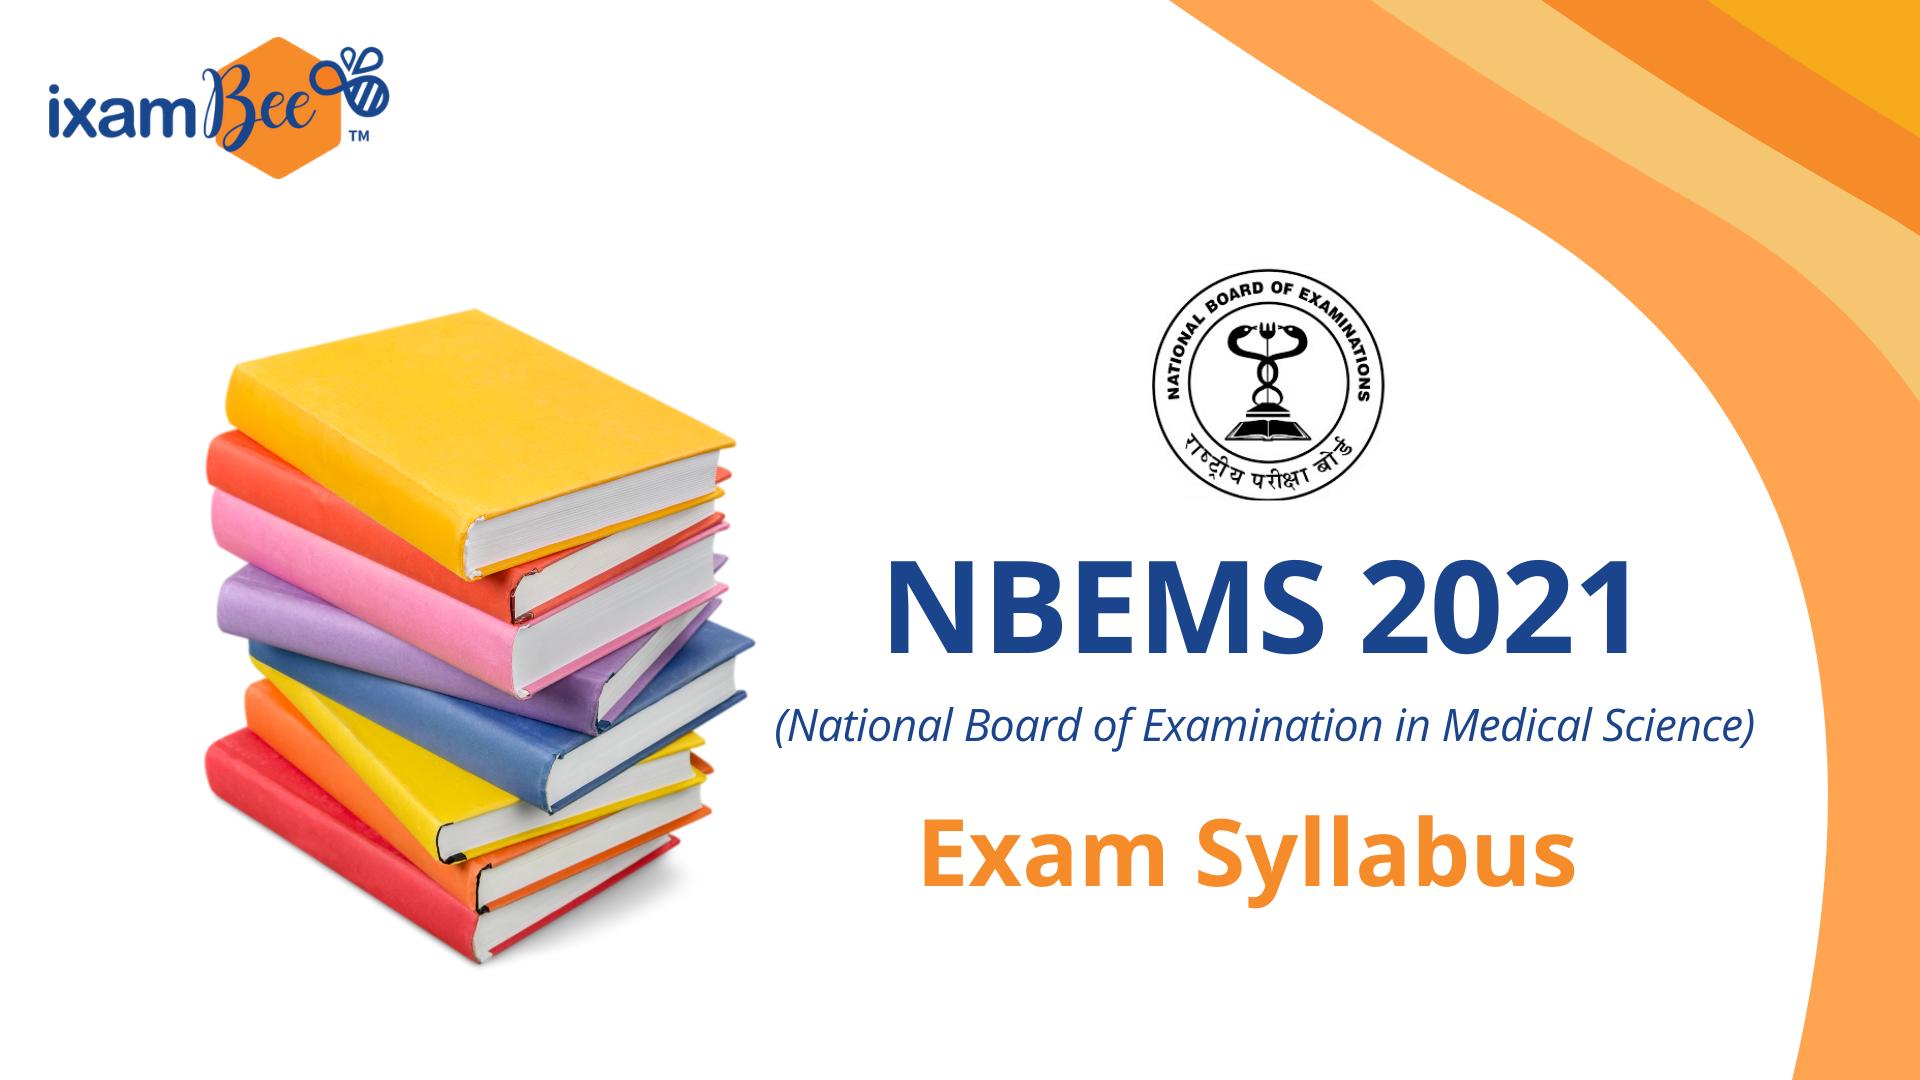 NBEMS Exam Syllabus